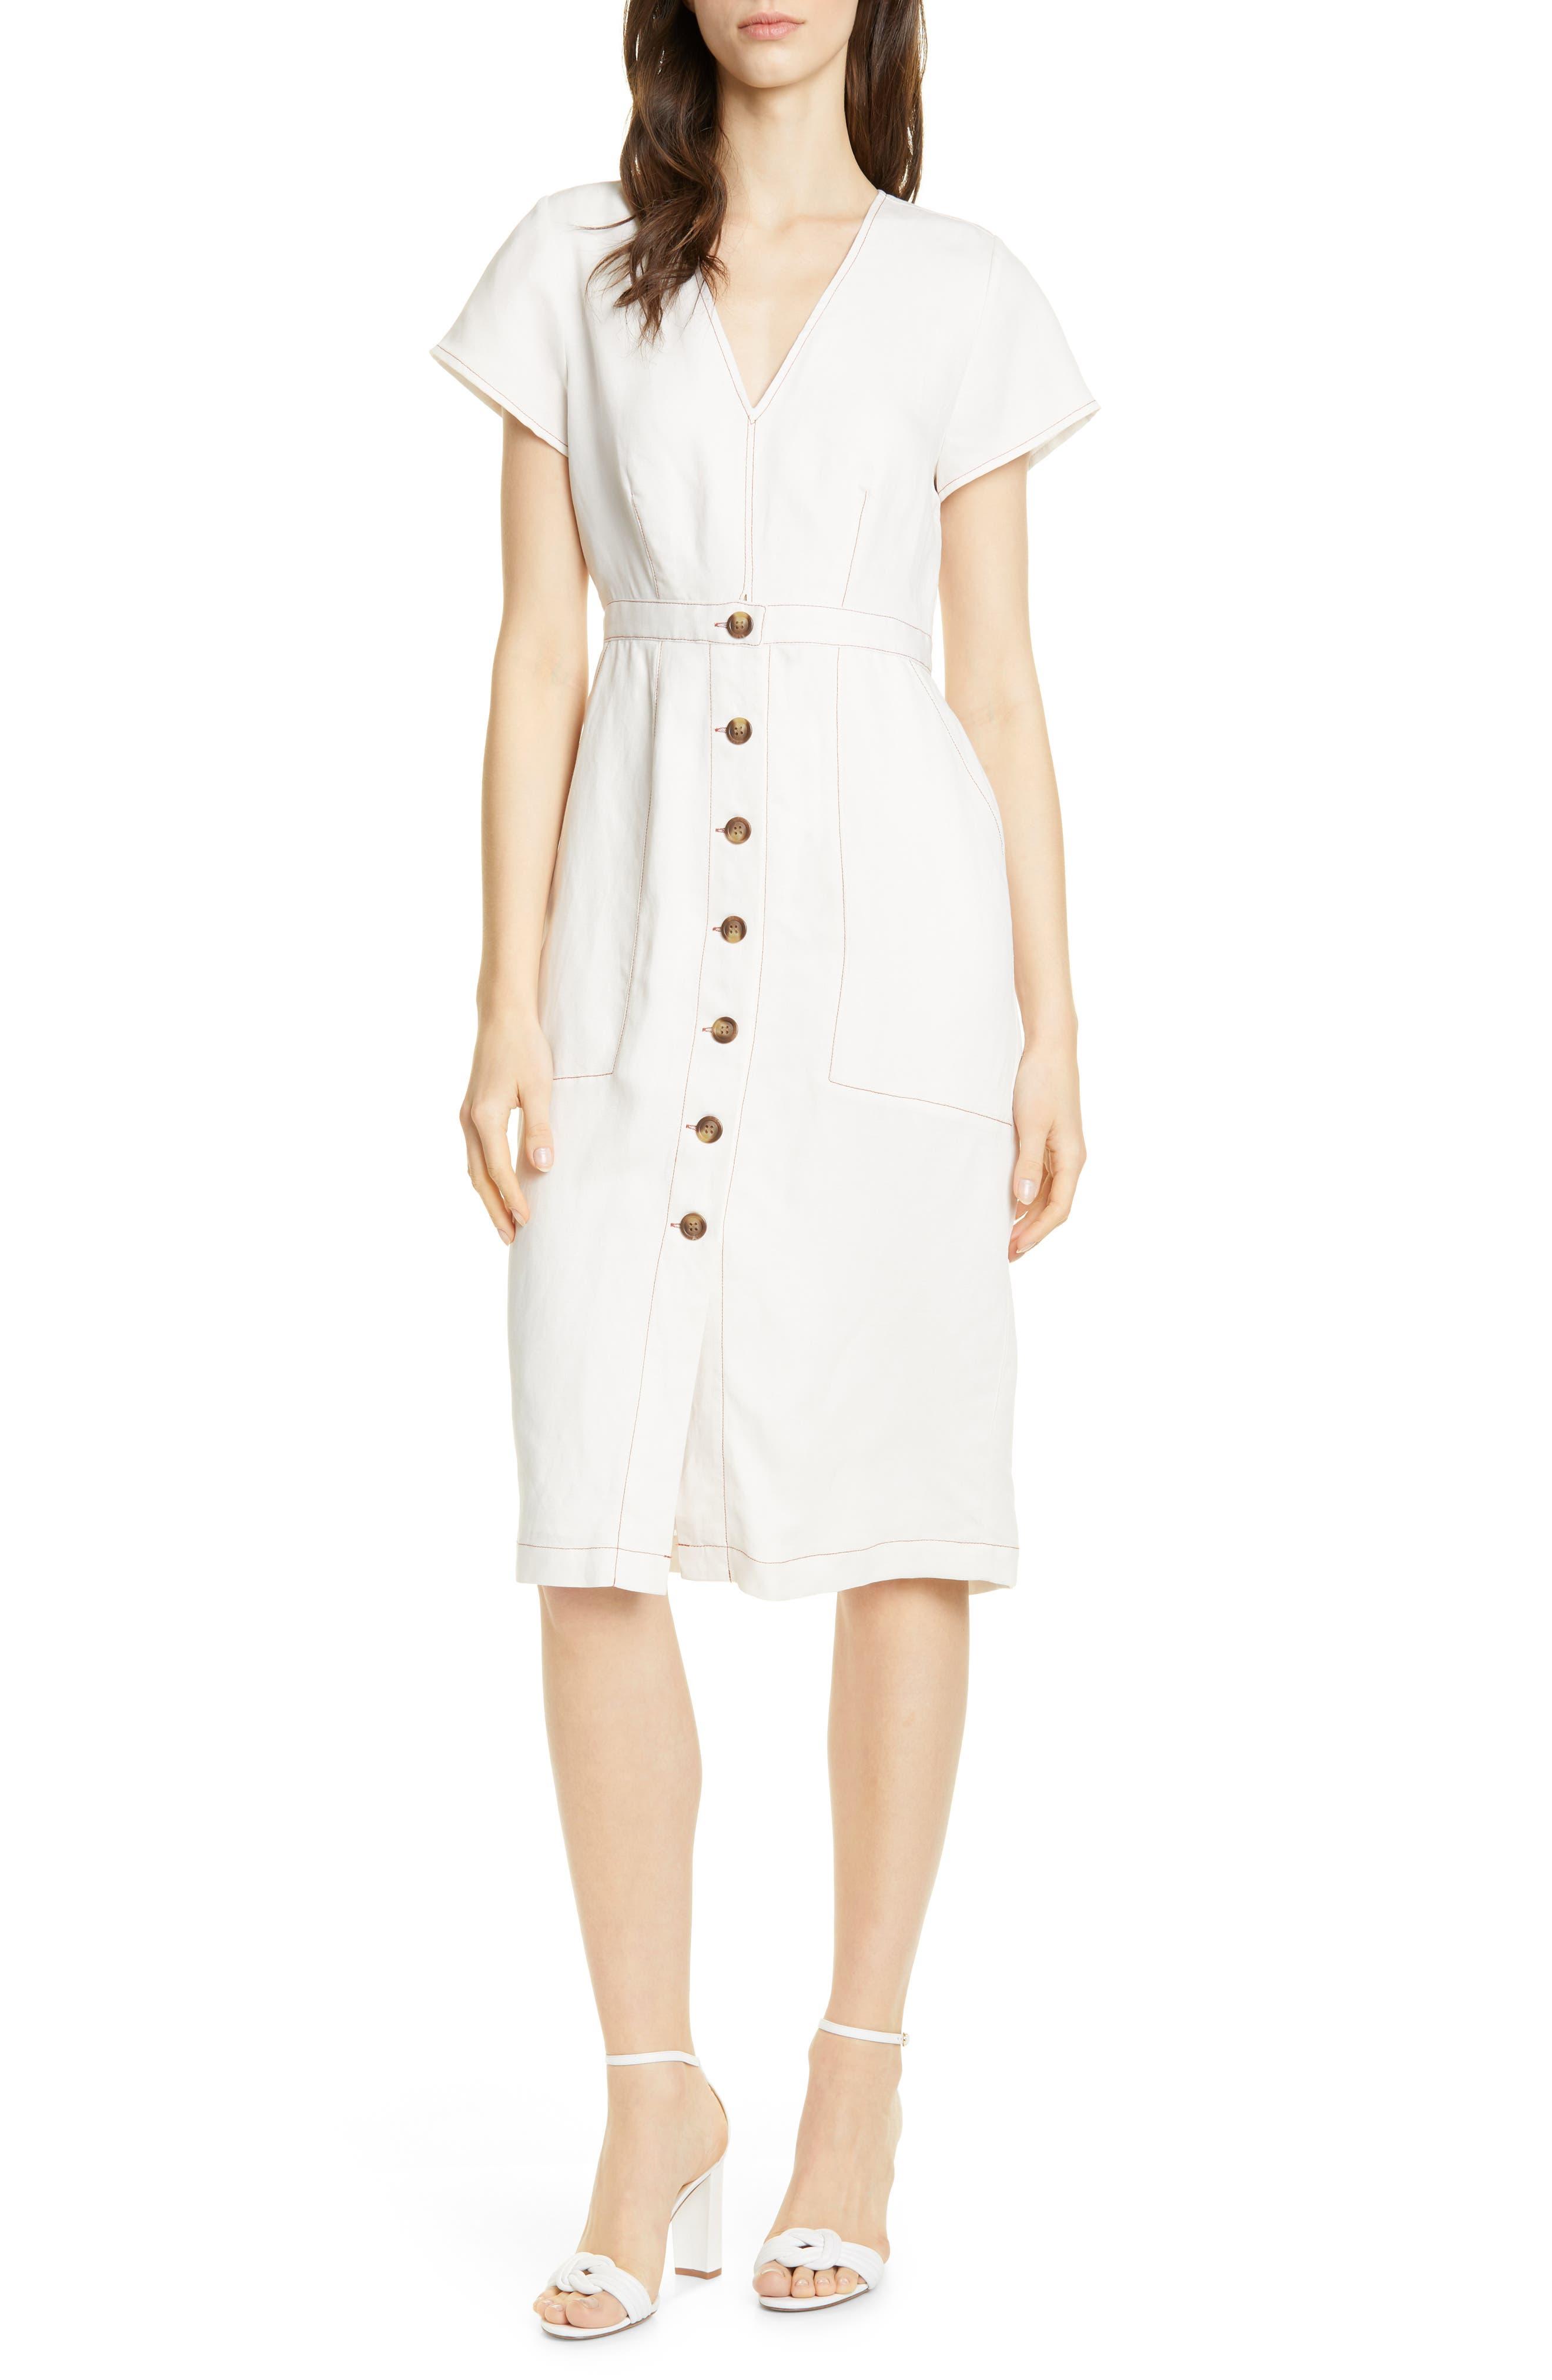 Dolan Rigby Topstitch Detail Button Front Midi Dress, White